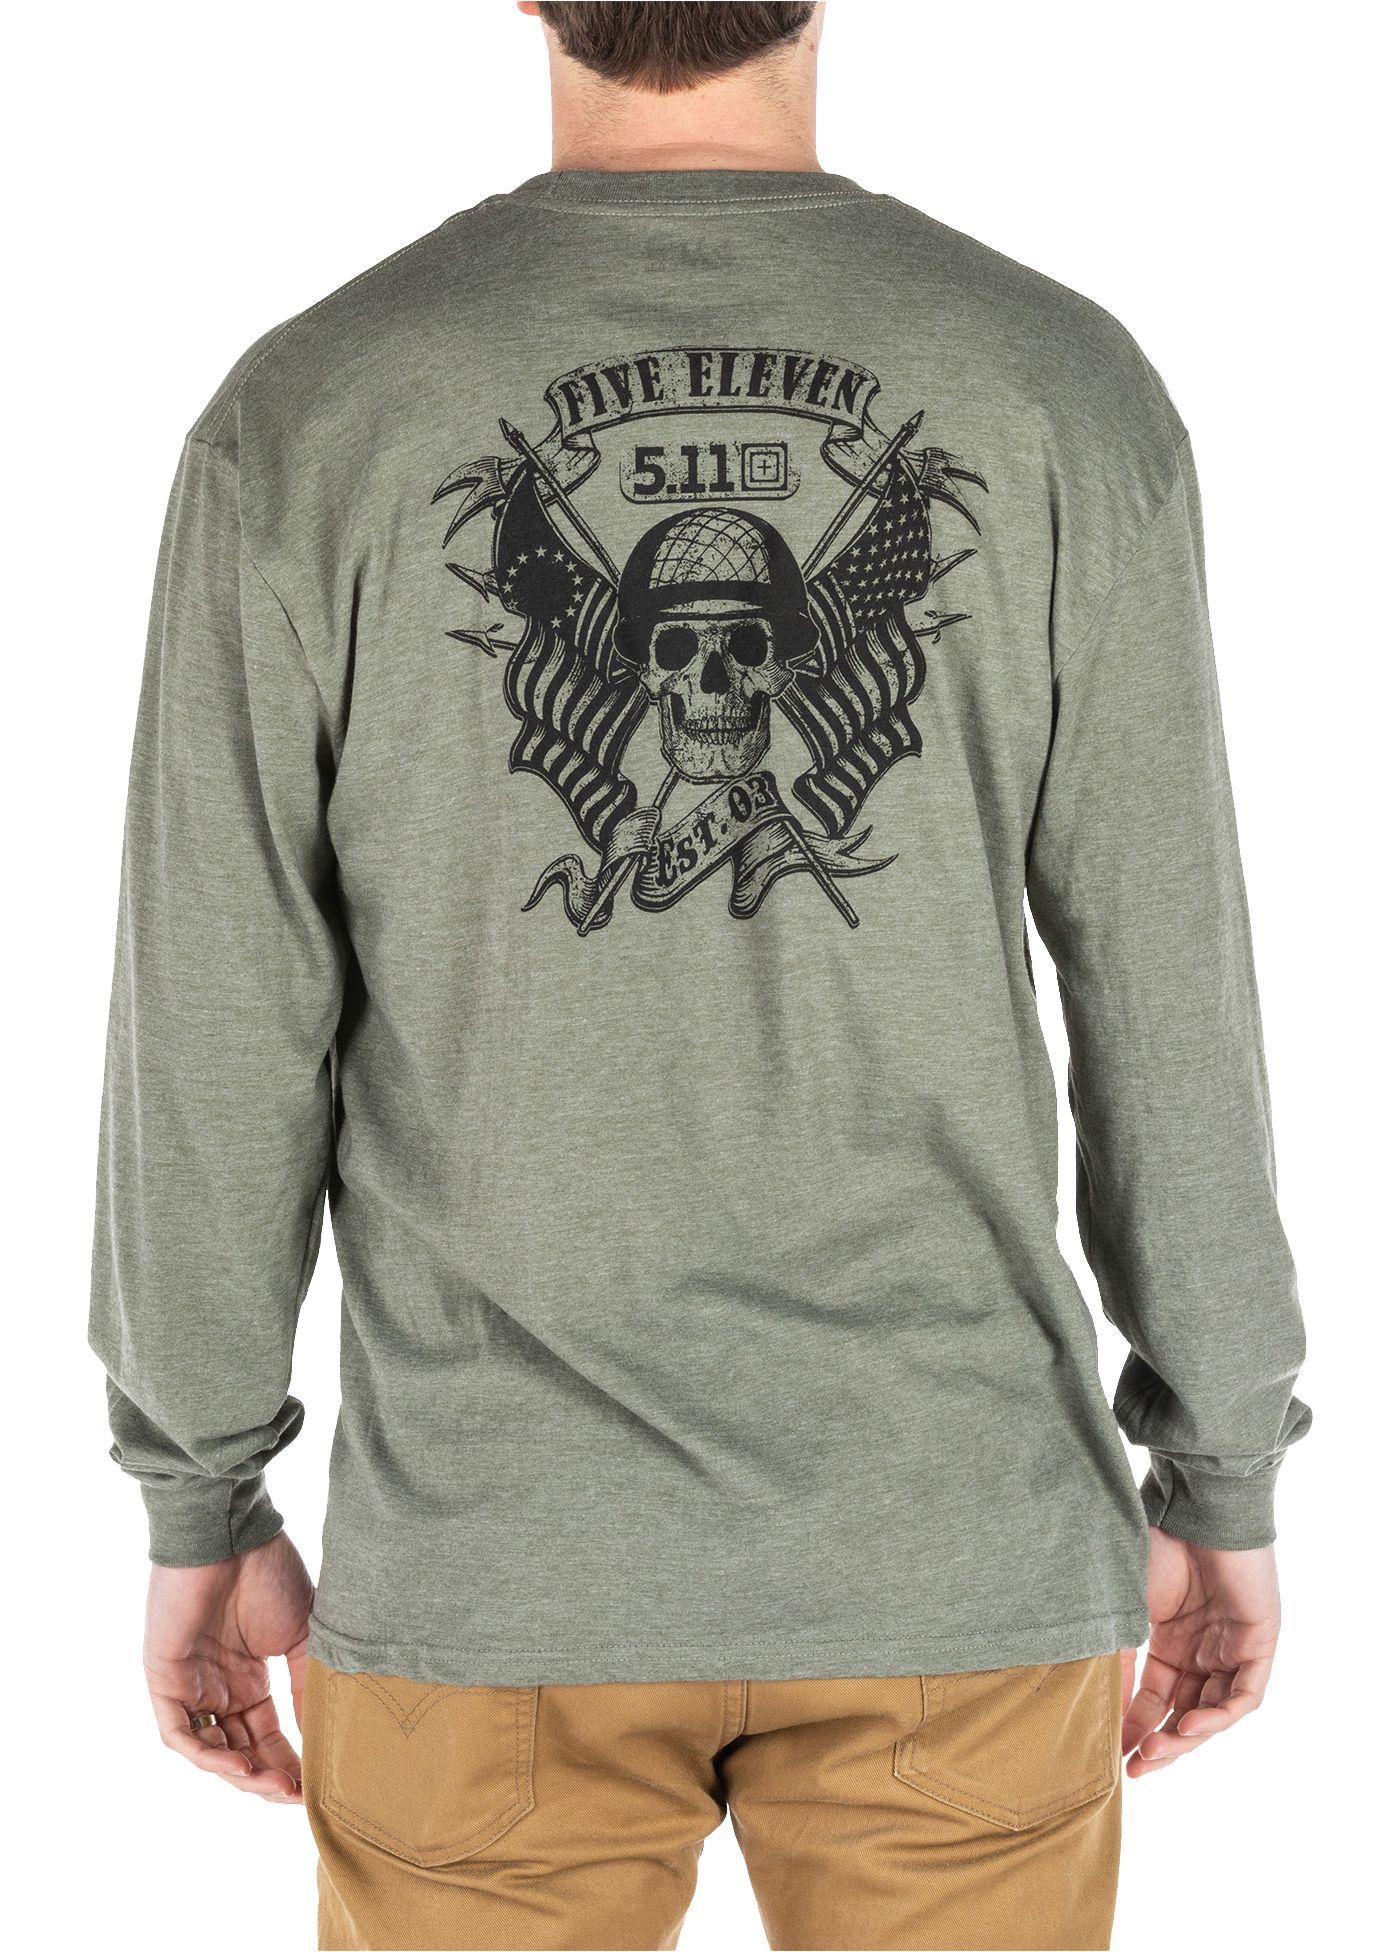 Men's 5.11 Tactical Banners and Bayonets Long Sleeve T-Shirt